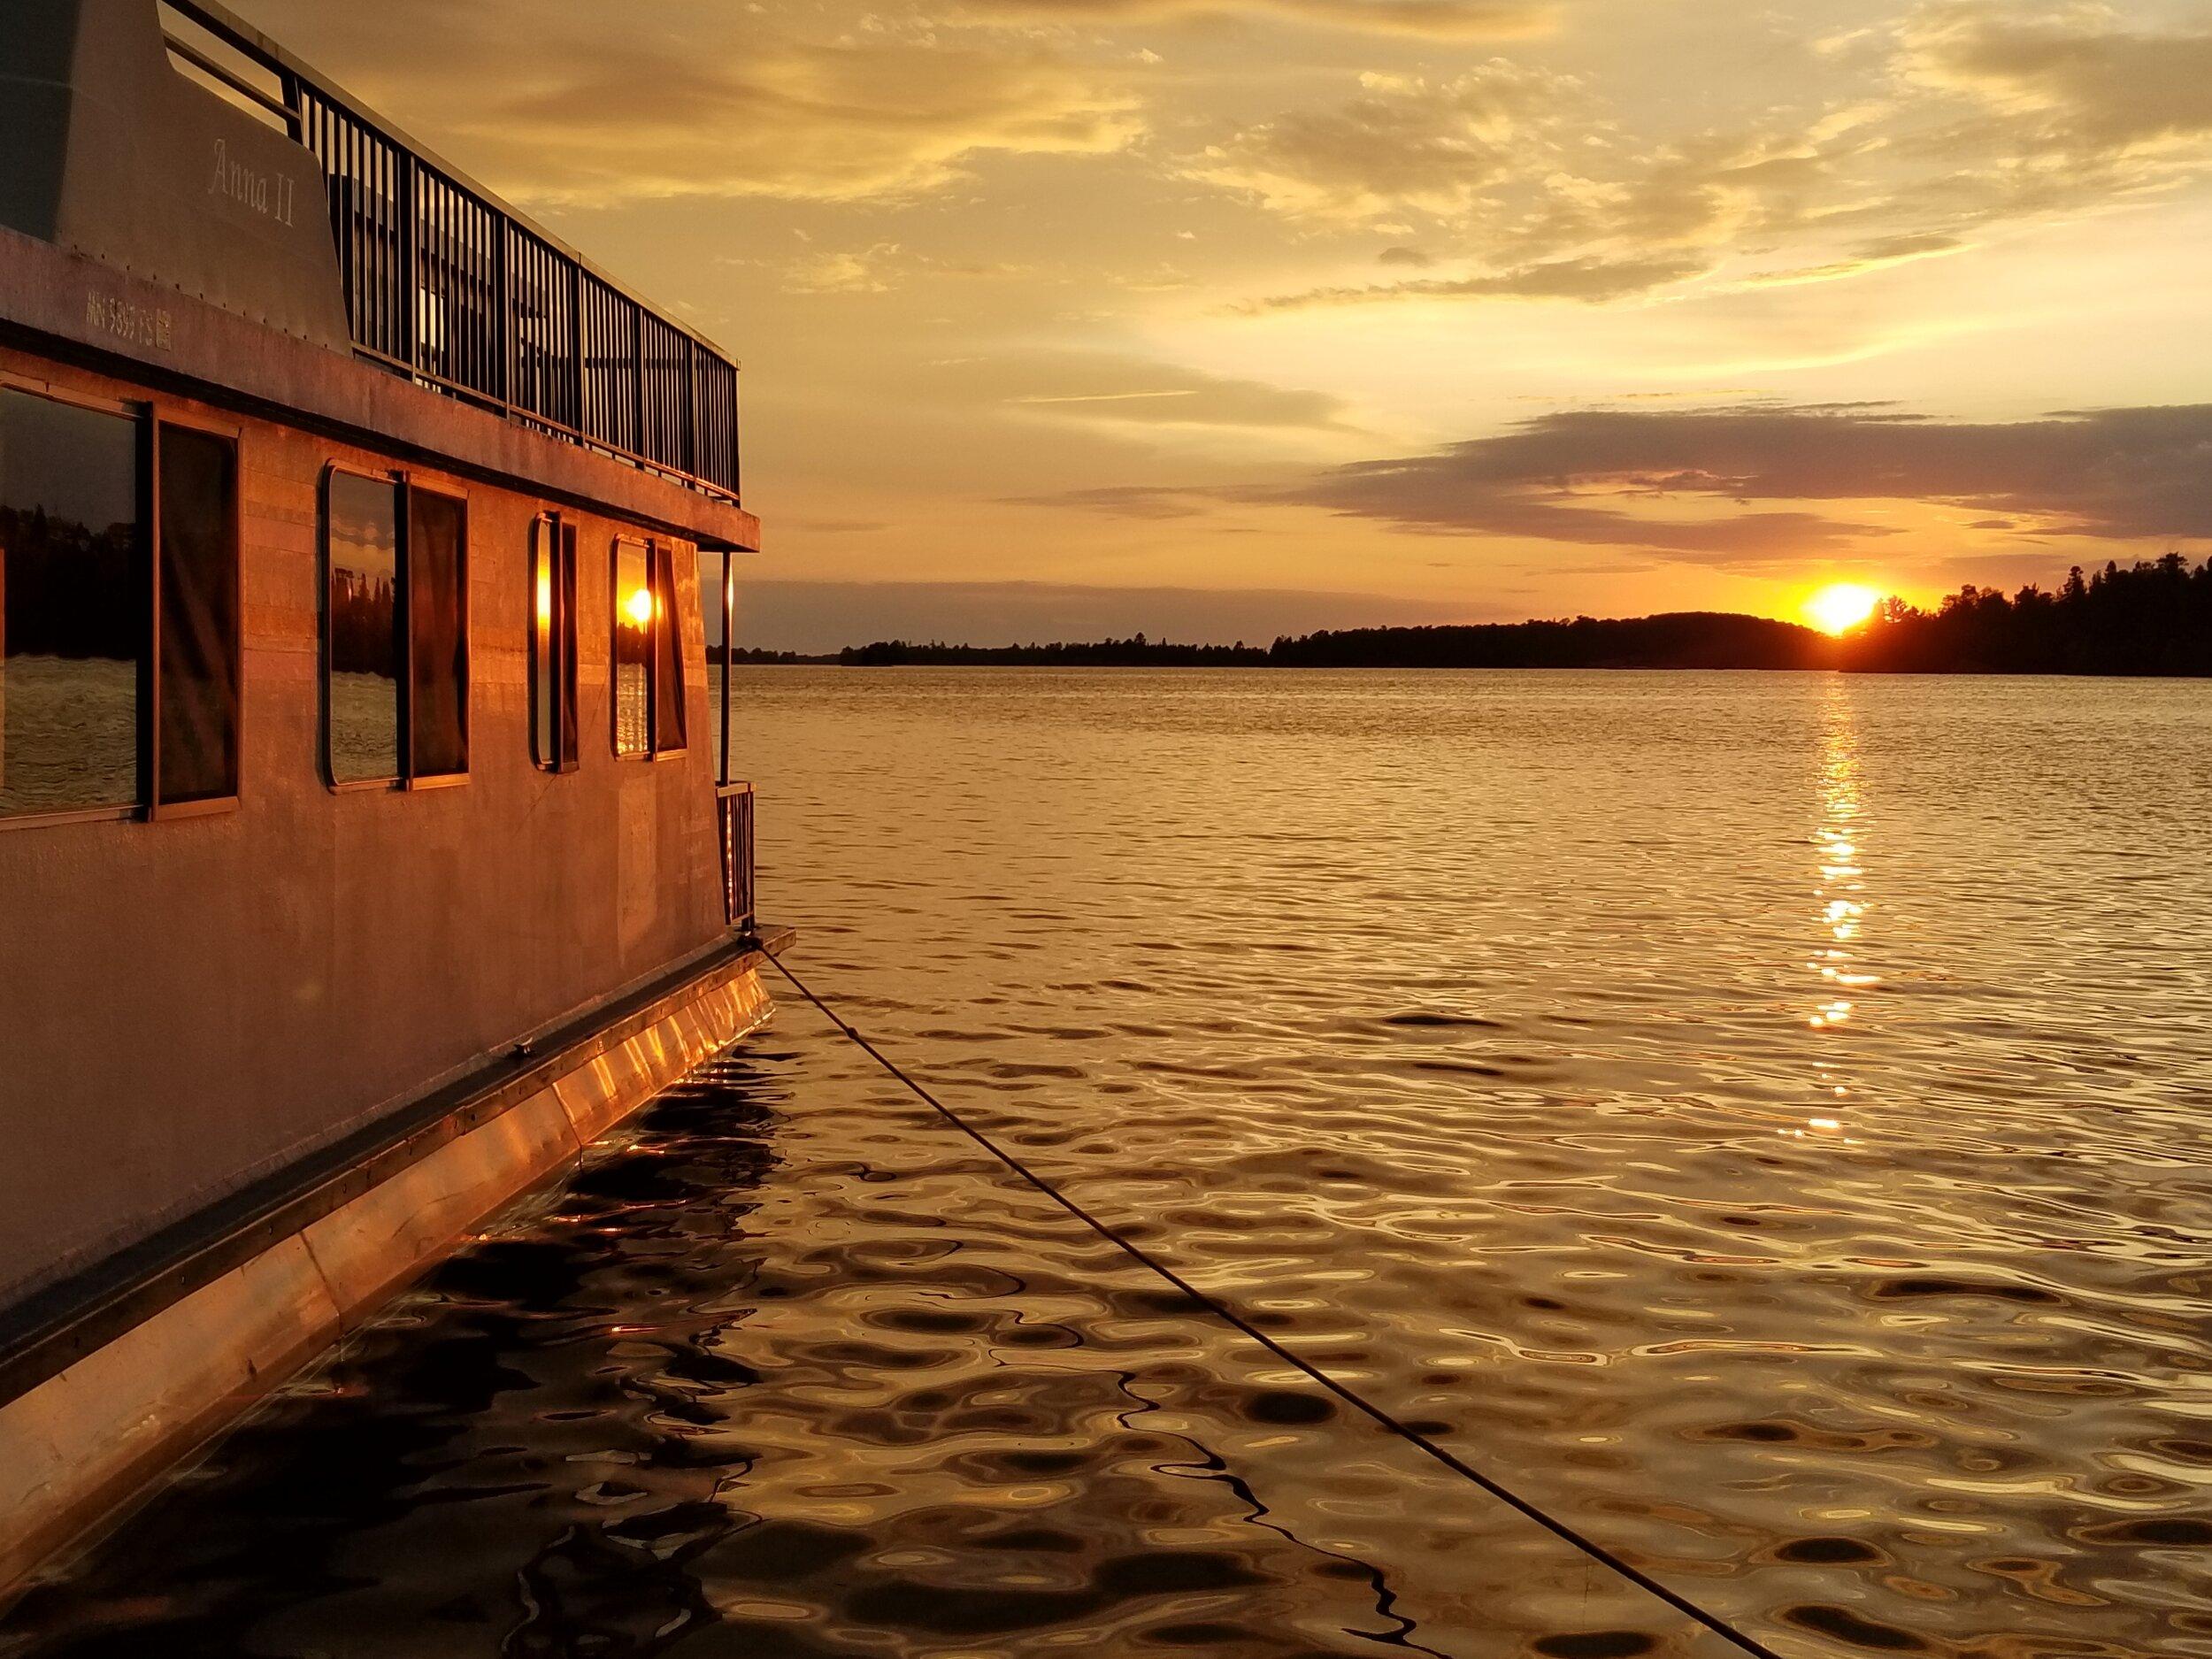 Shelley_Gerjets_HouseboatWithSunset.jpg